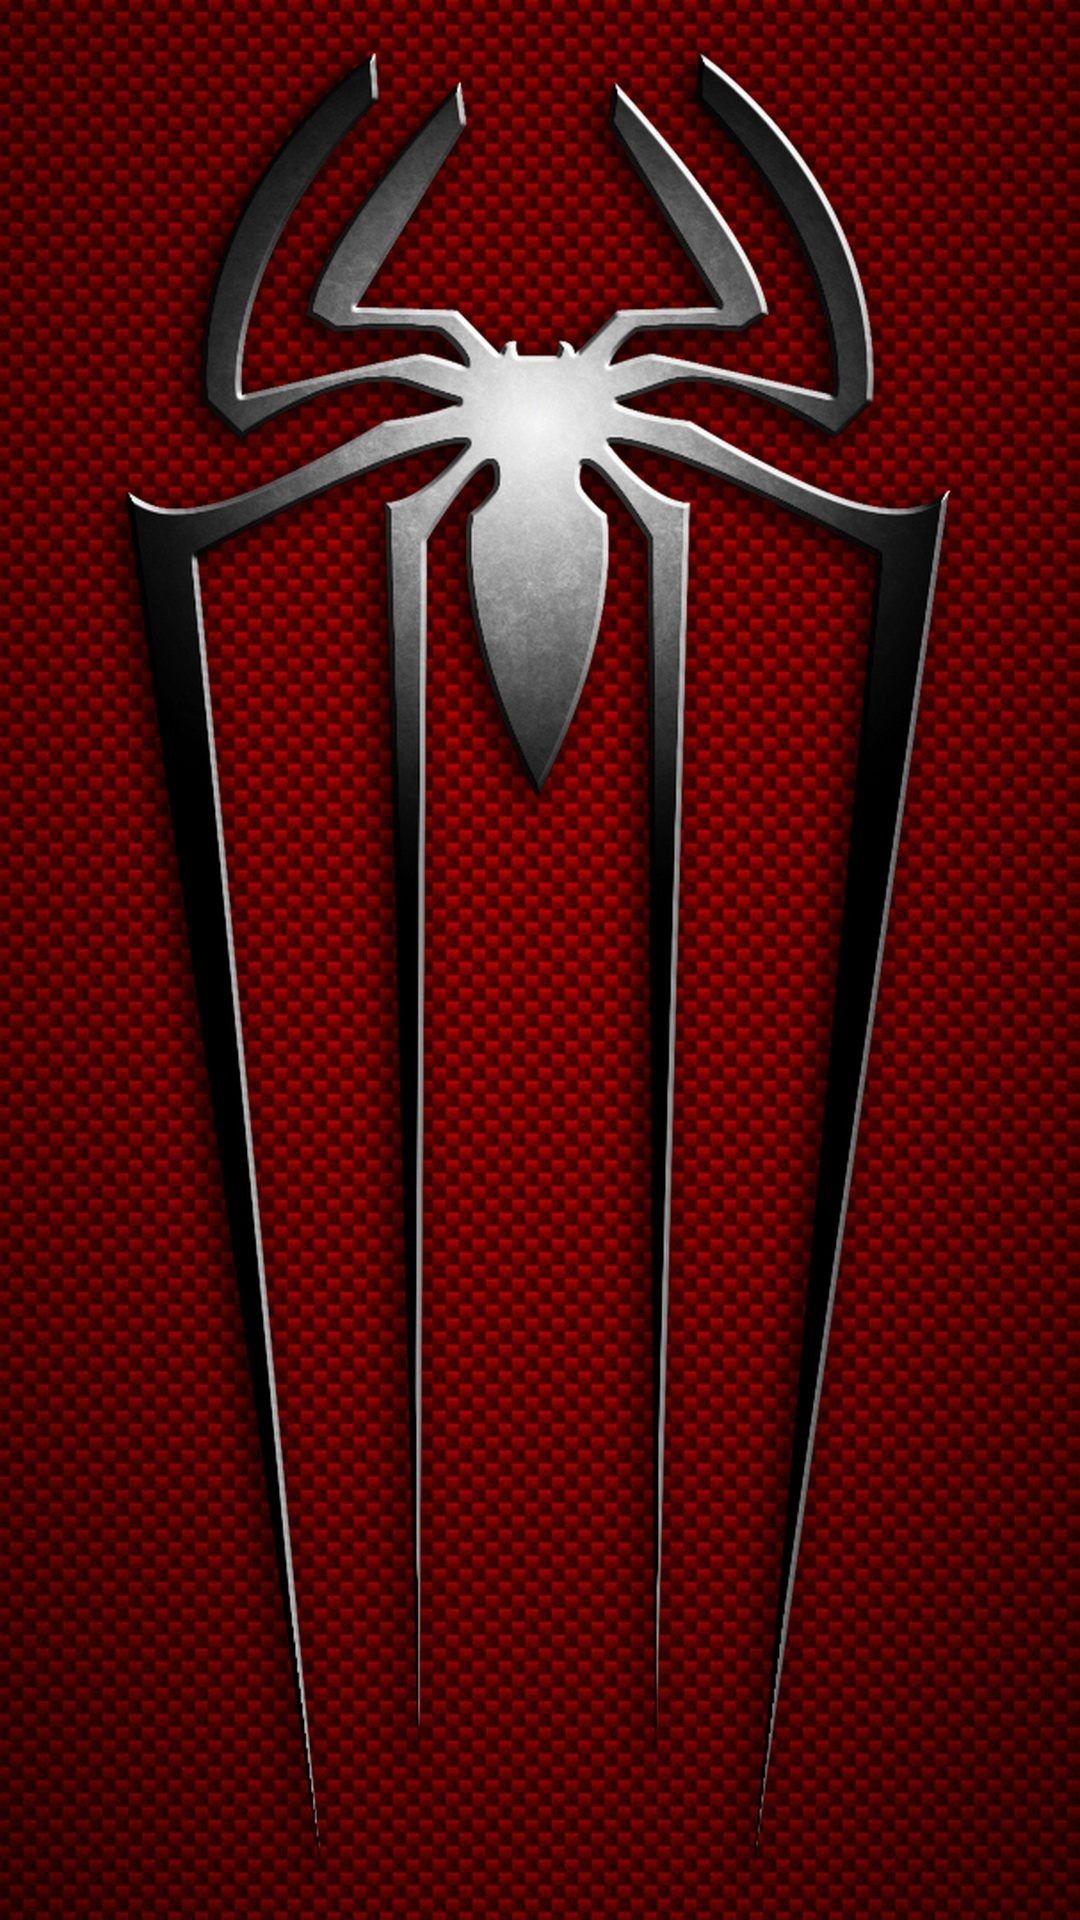 Download Spiderman Logo 1080 X 1920 Wallpapers 4741608 Alt Image Iron Man Hd Wallpaper Spiderman Ps4 Wallpaper Logo Wallpaper Hd